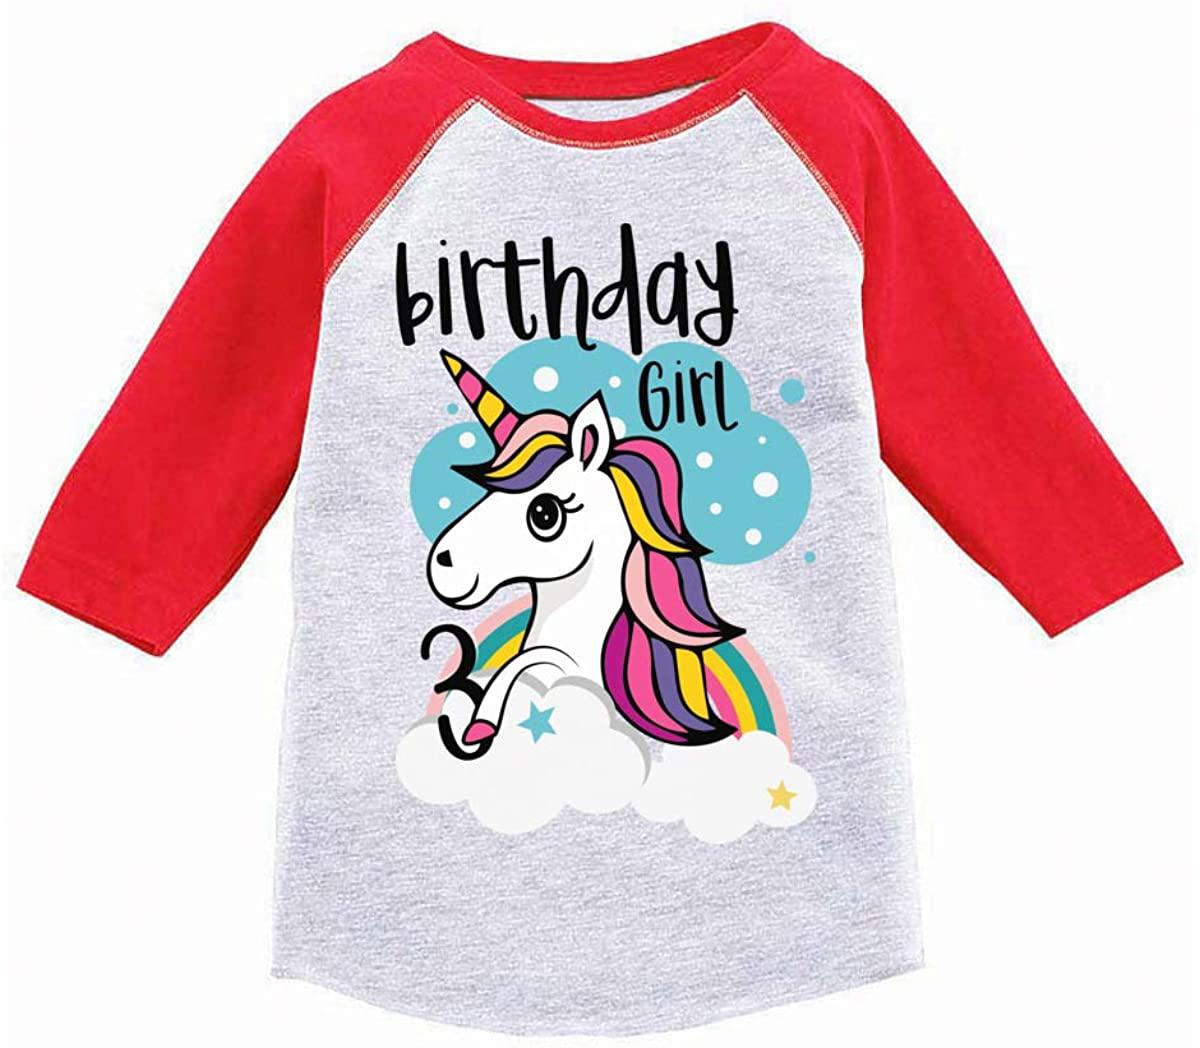 Awkward Styles Birthday Girl Toddler Raglan Unicorn Tshirt 3rd Birthday Party